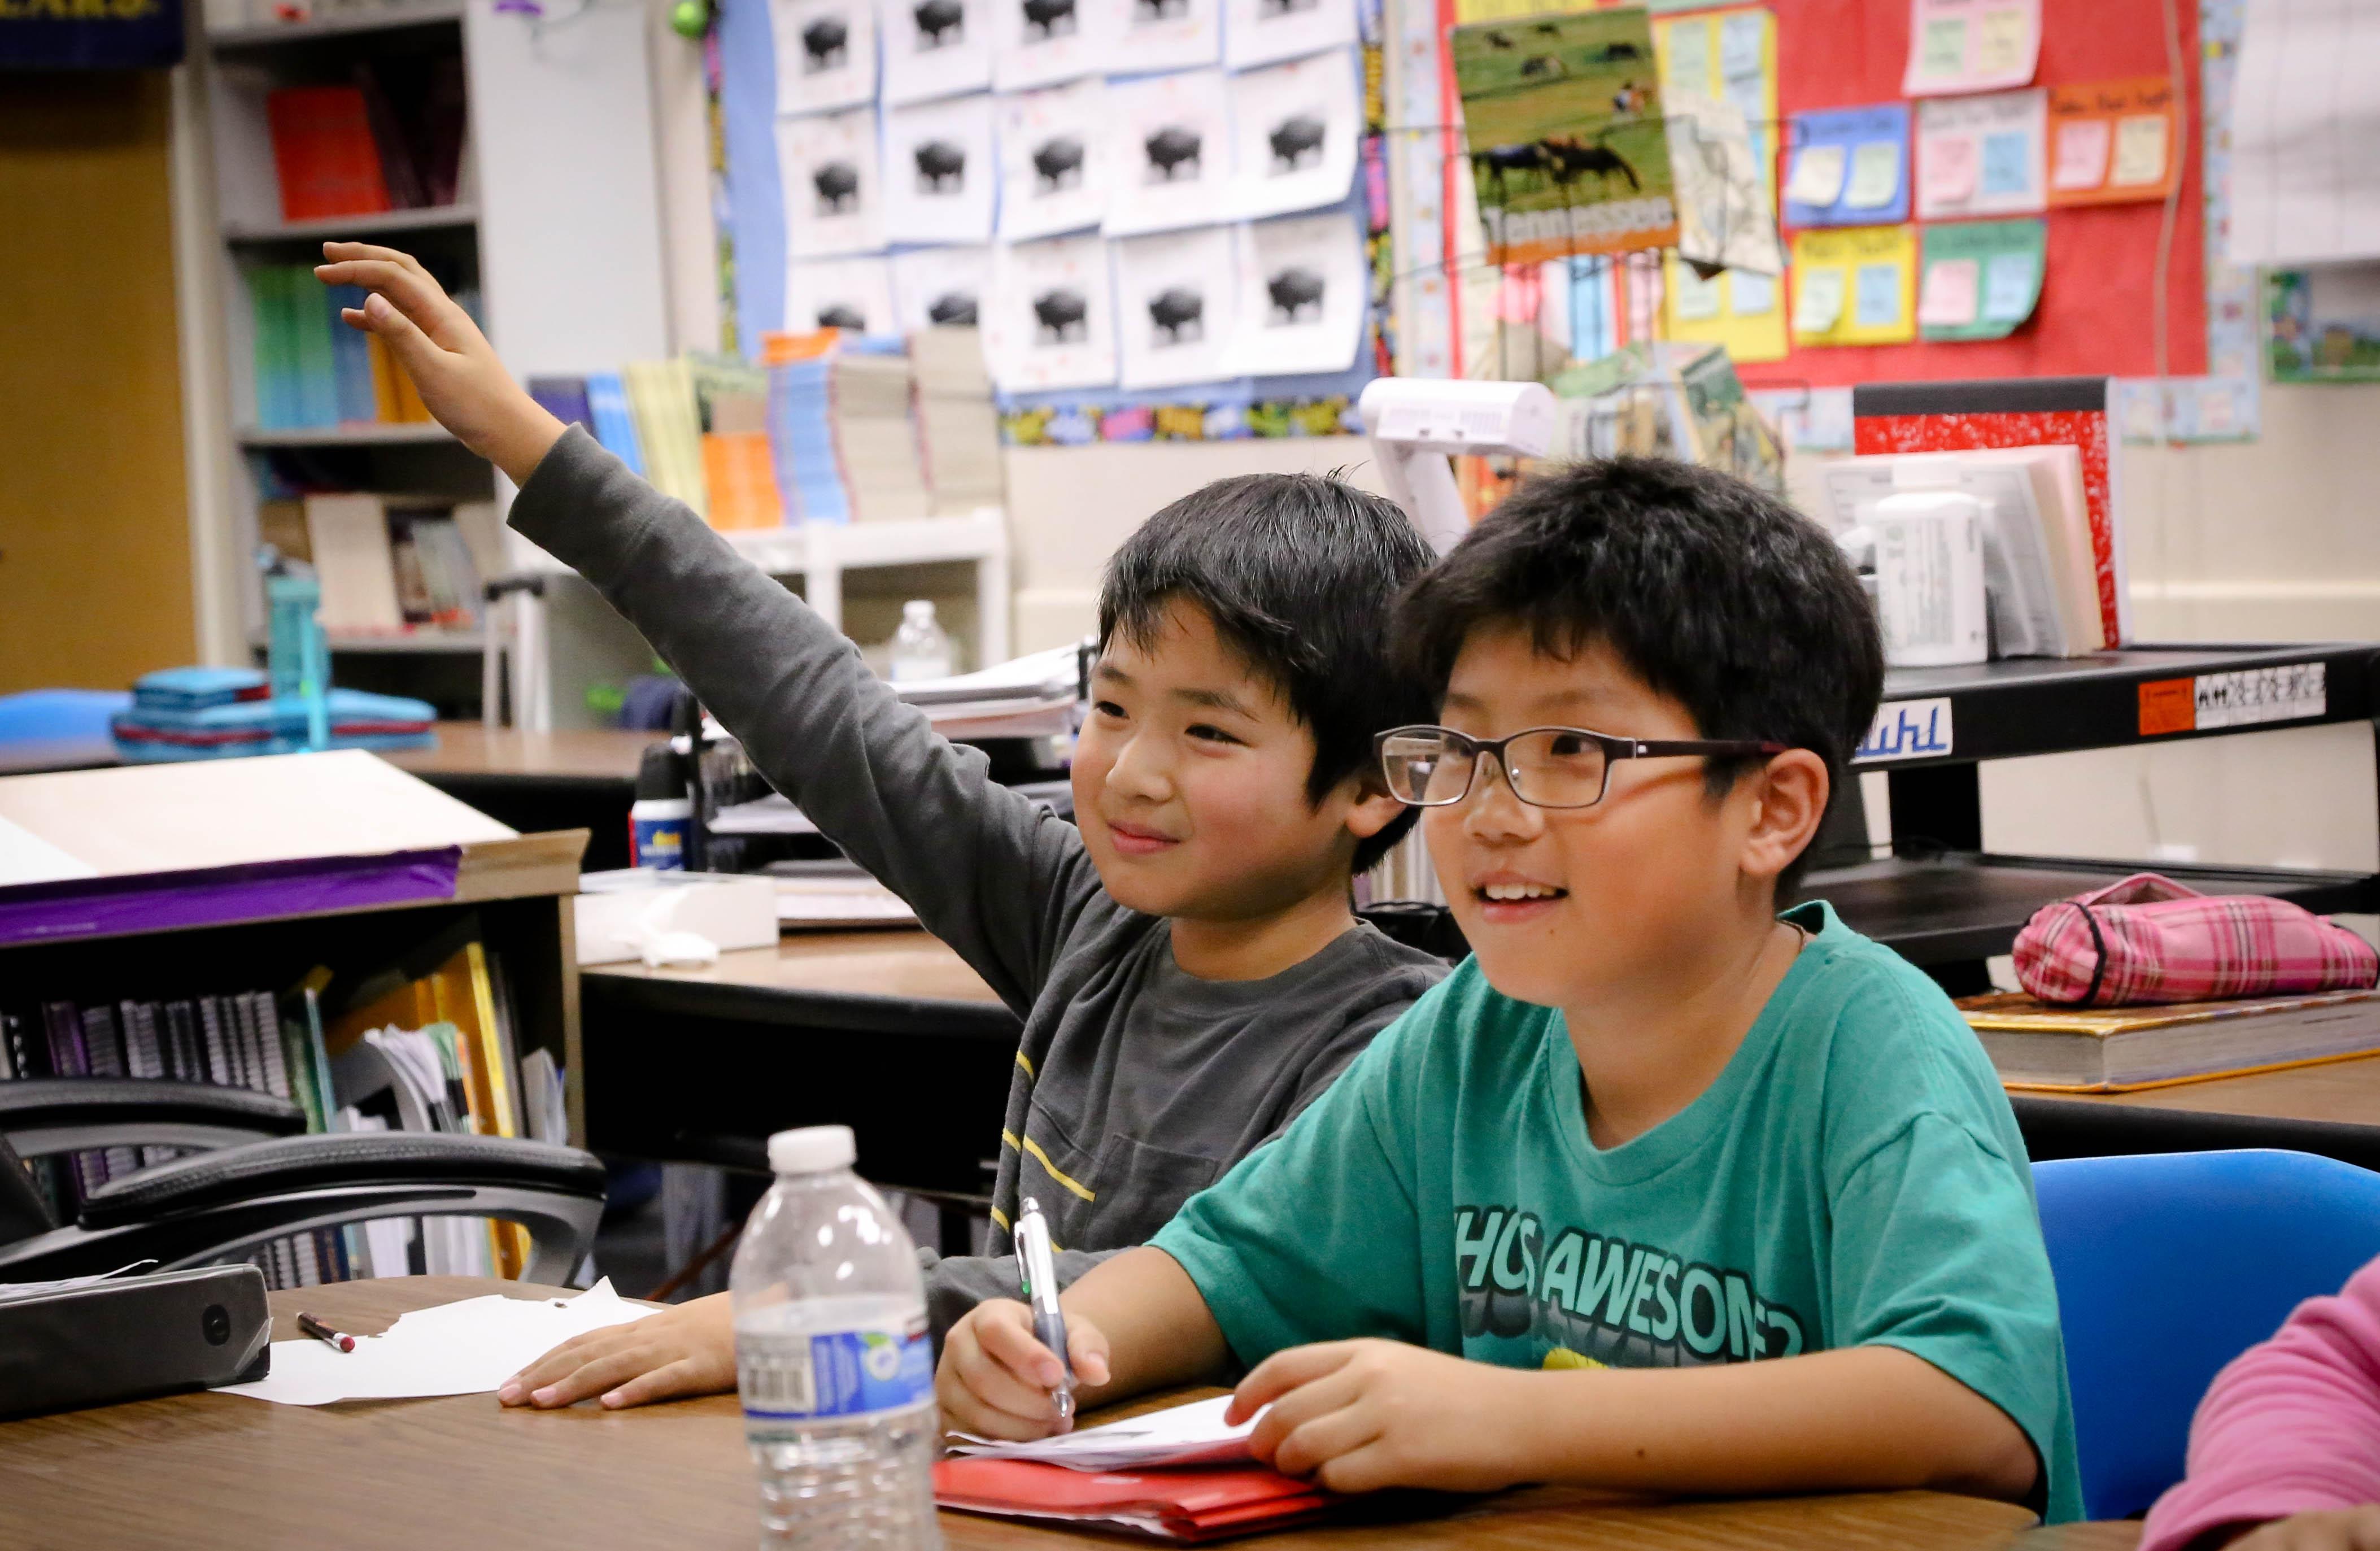 Worksheet School Learning Programs programs american chinese school after learning program